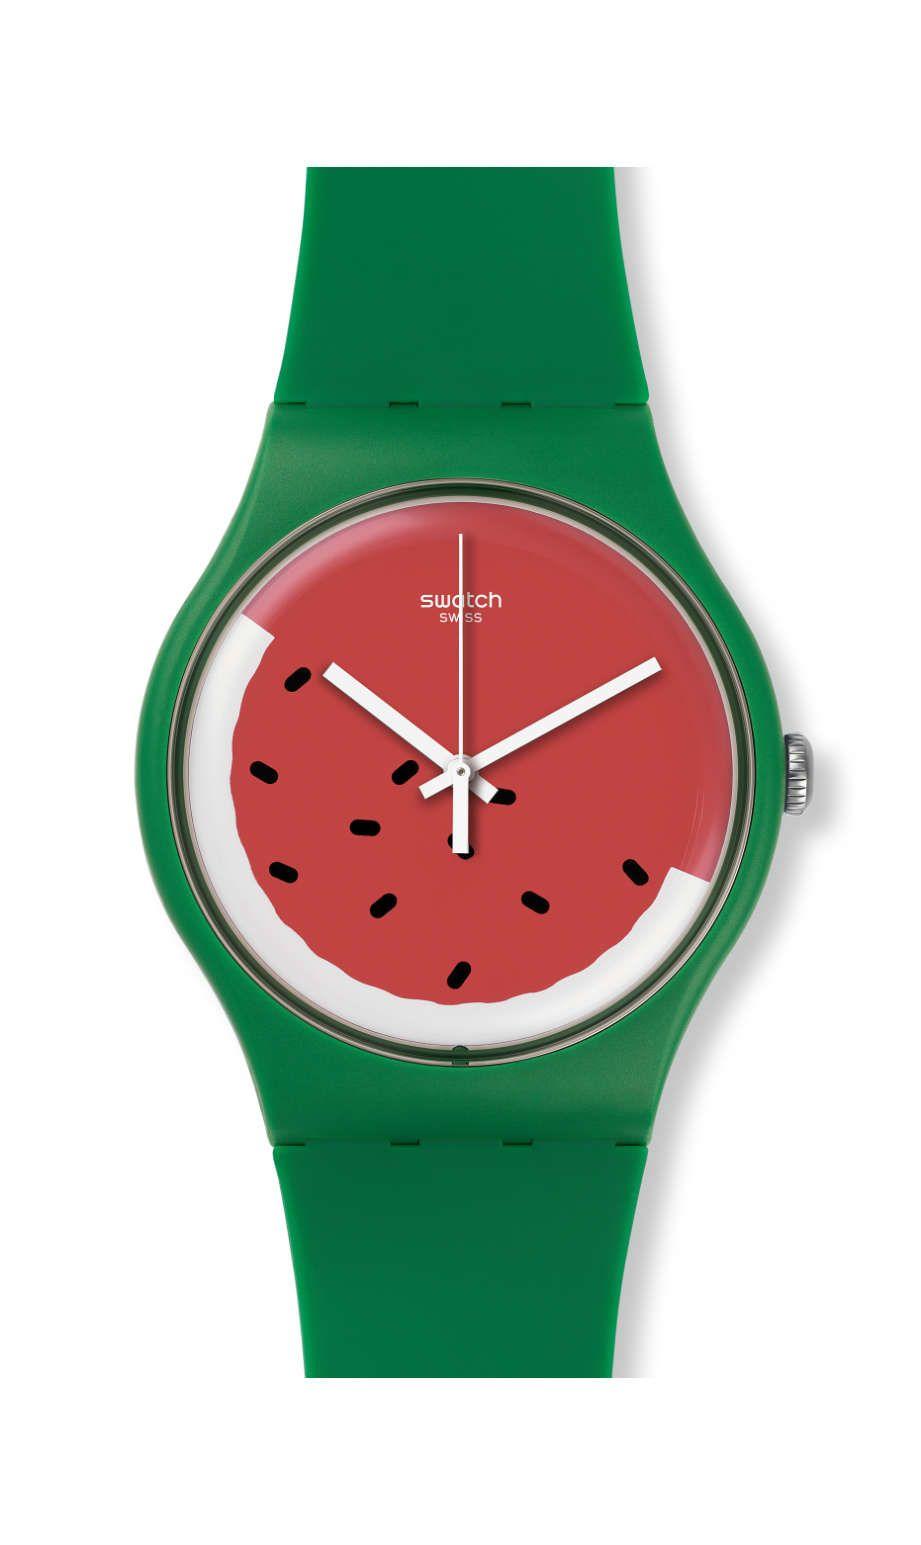 Swatch 2019 VerdulerasRelojes En Watch Pasteque Las Para sQhdrt